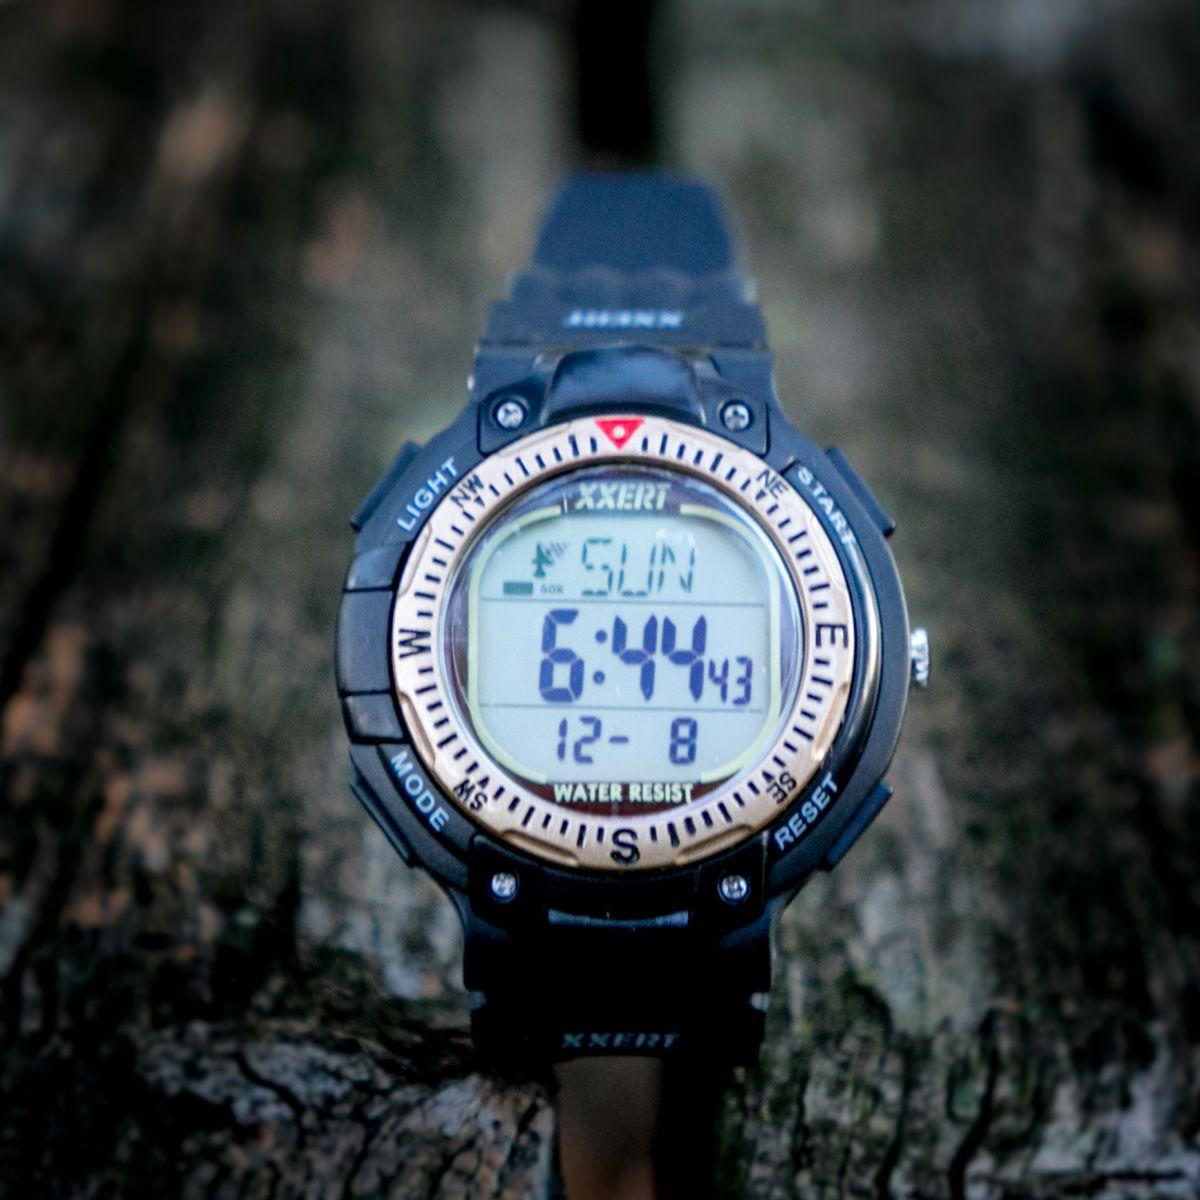 XXERT(エグザート) 腕時計 電波 ソーラー ウォッチ 10気圧防水 カレンダー アウトドア ビジネス 部活 入学 卒業 お祝い プレゼント 小学生 XXW-502 ゴールド 1本